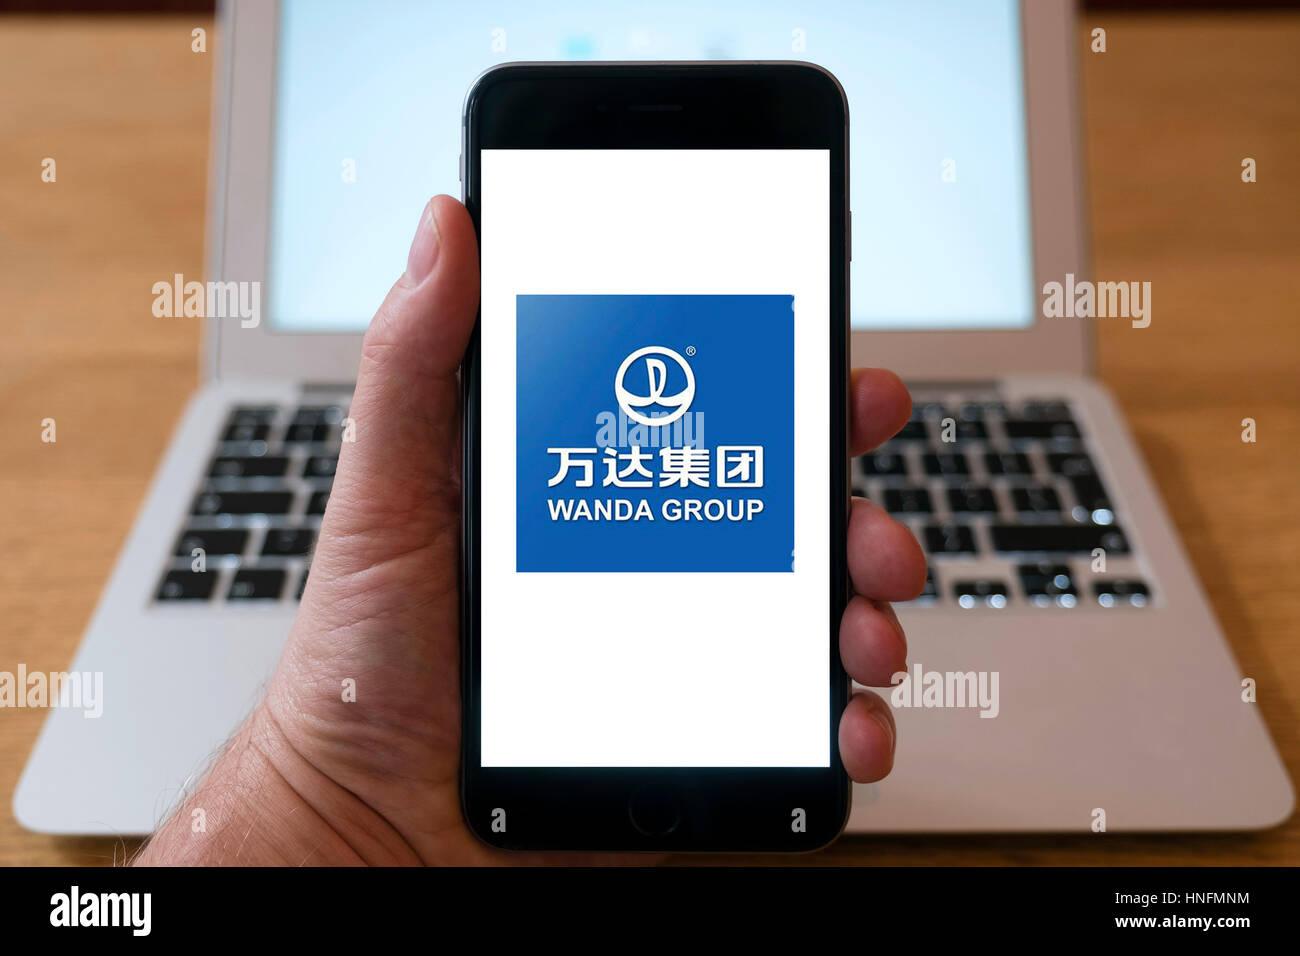 Chinese Wanda Group multinational conglomerate corporation logo on smart phone screen. - Stock Image